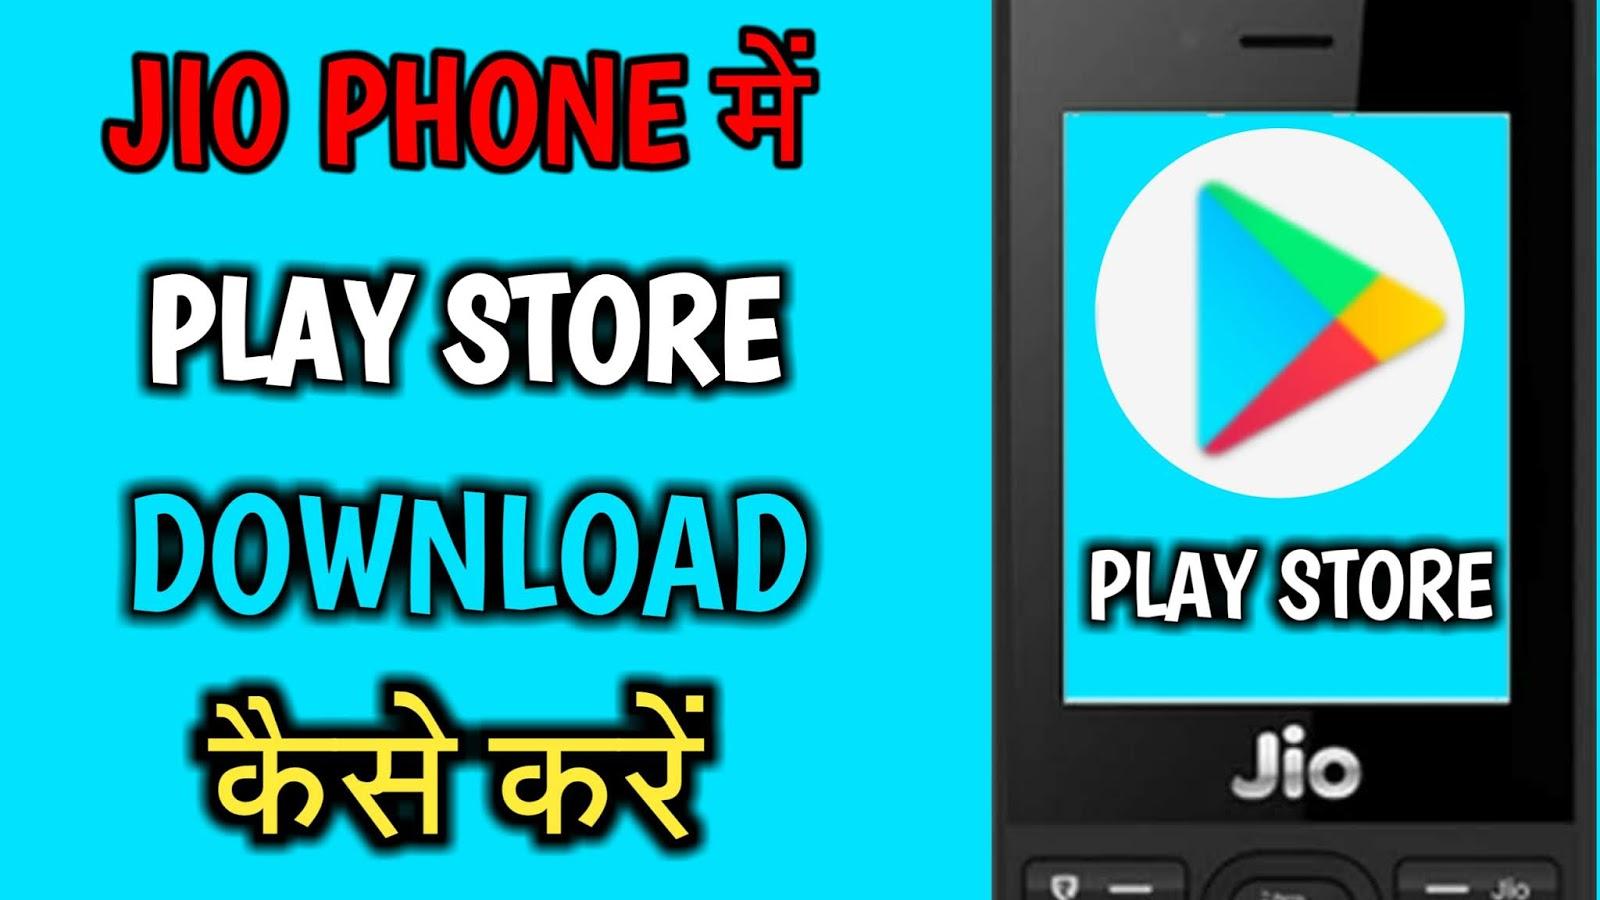 jio phone play store apk download